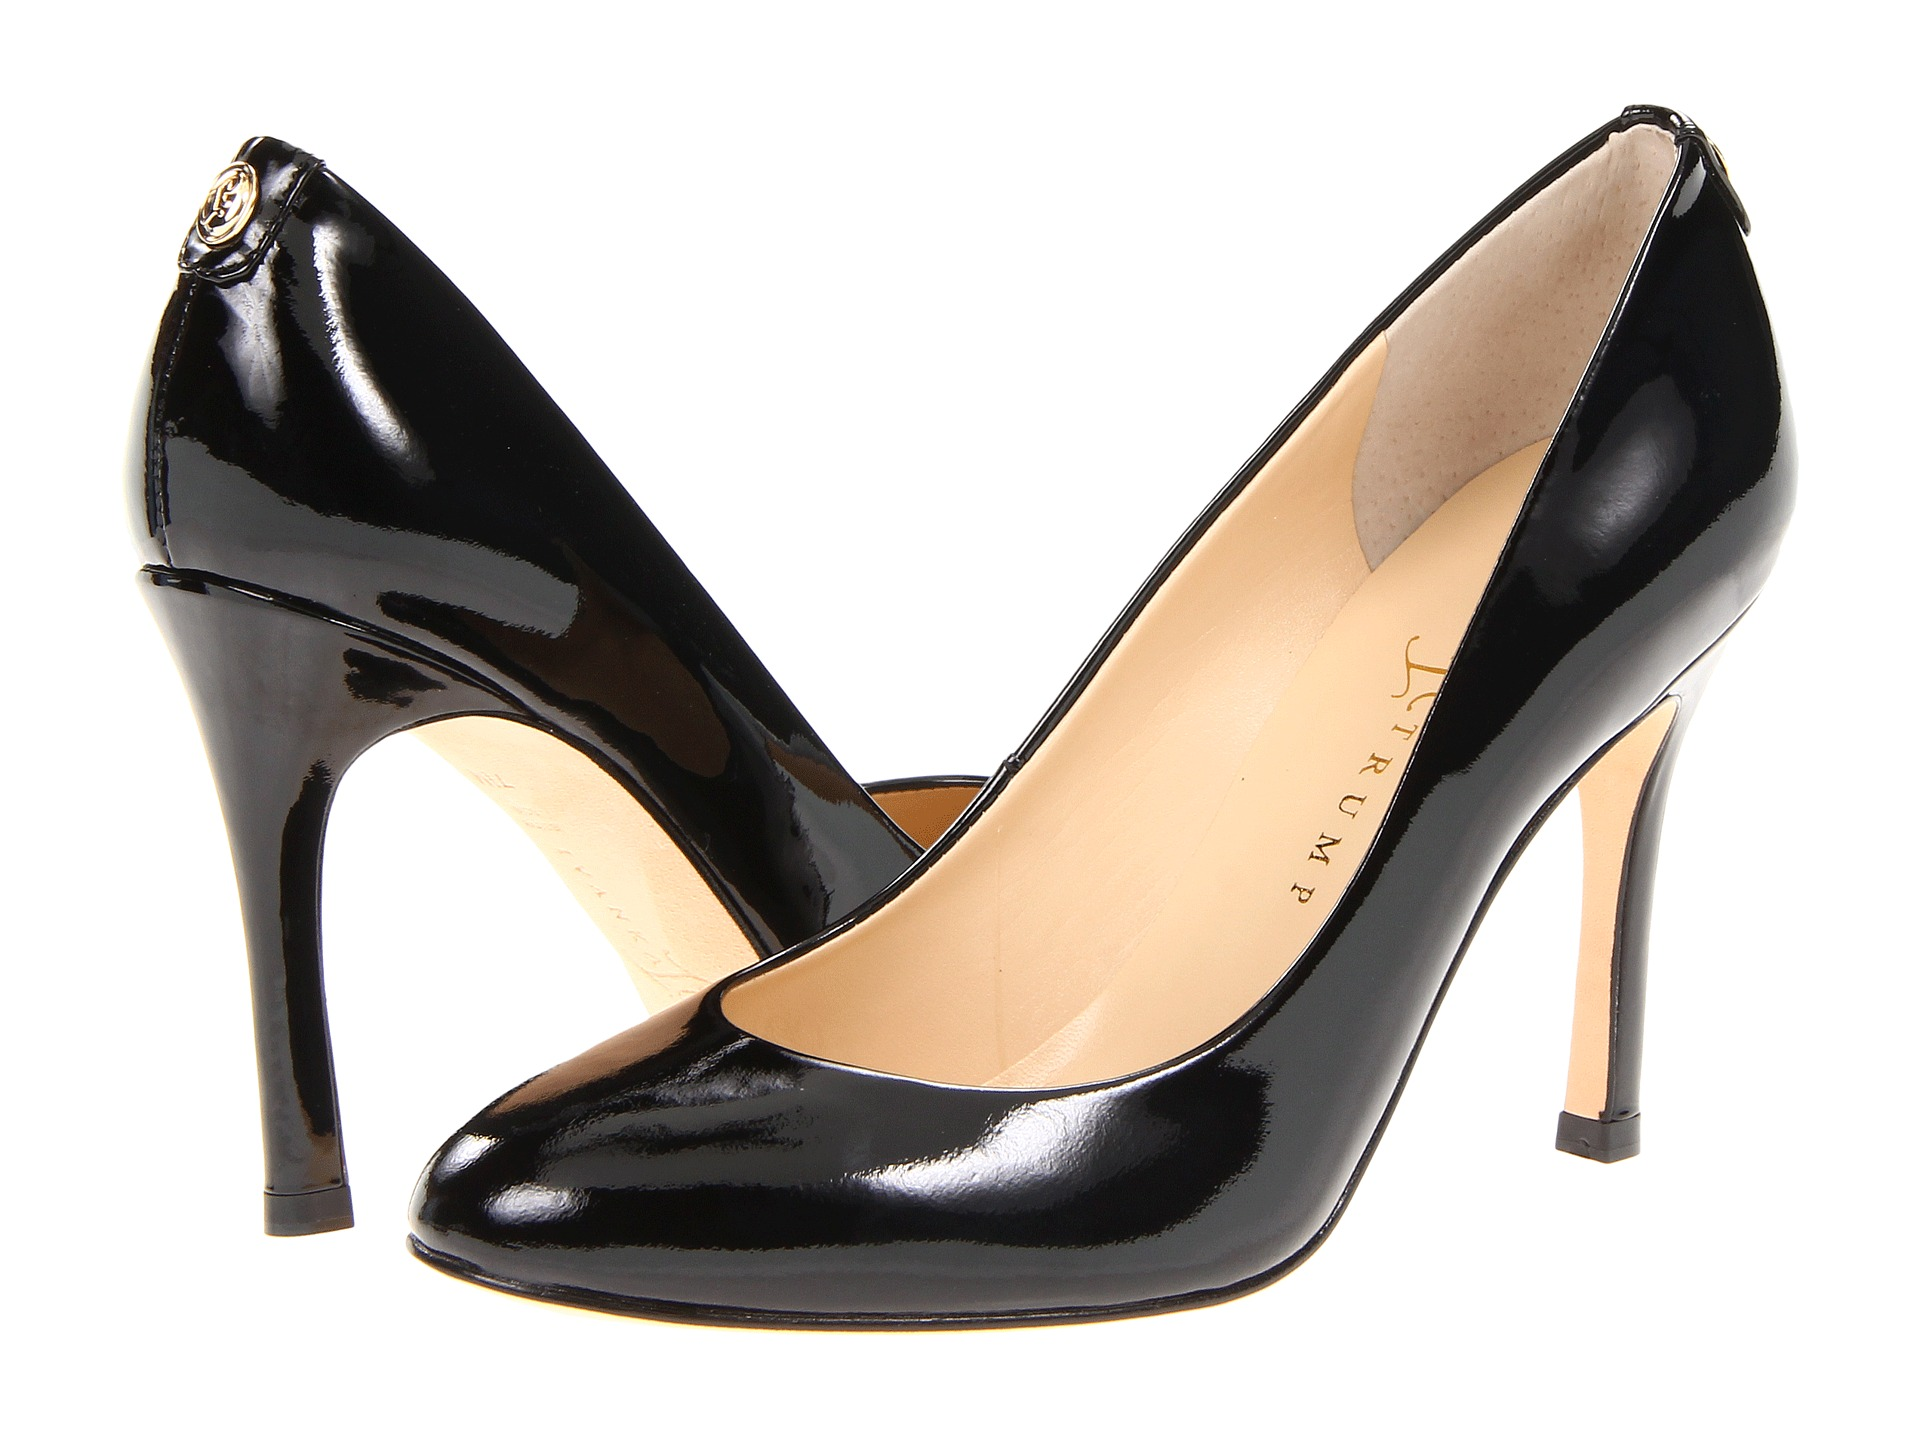 Ivanka Trump Janie at ... Ivanka Trump Shoes Online